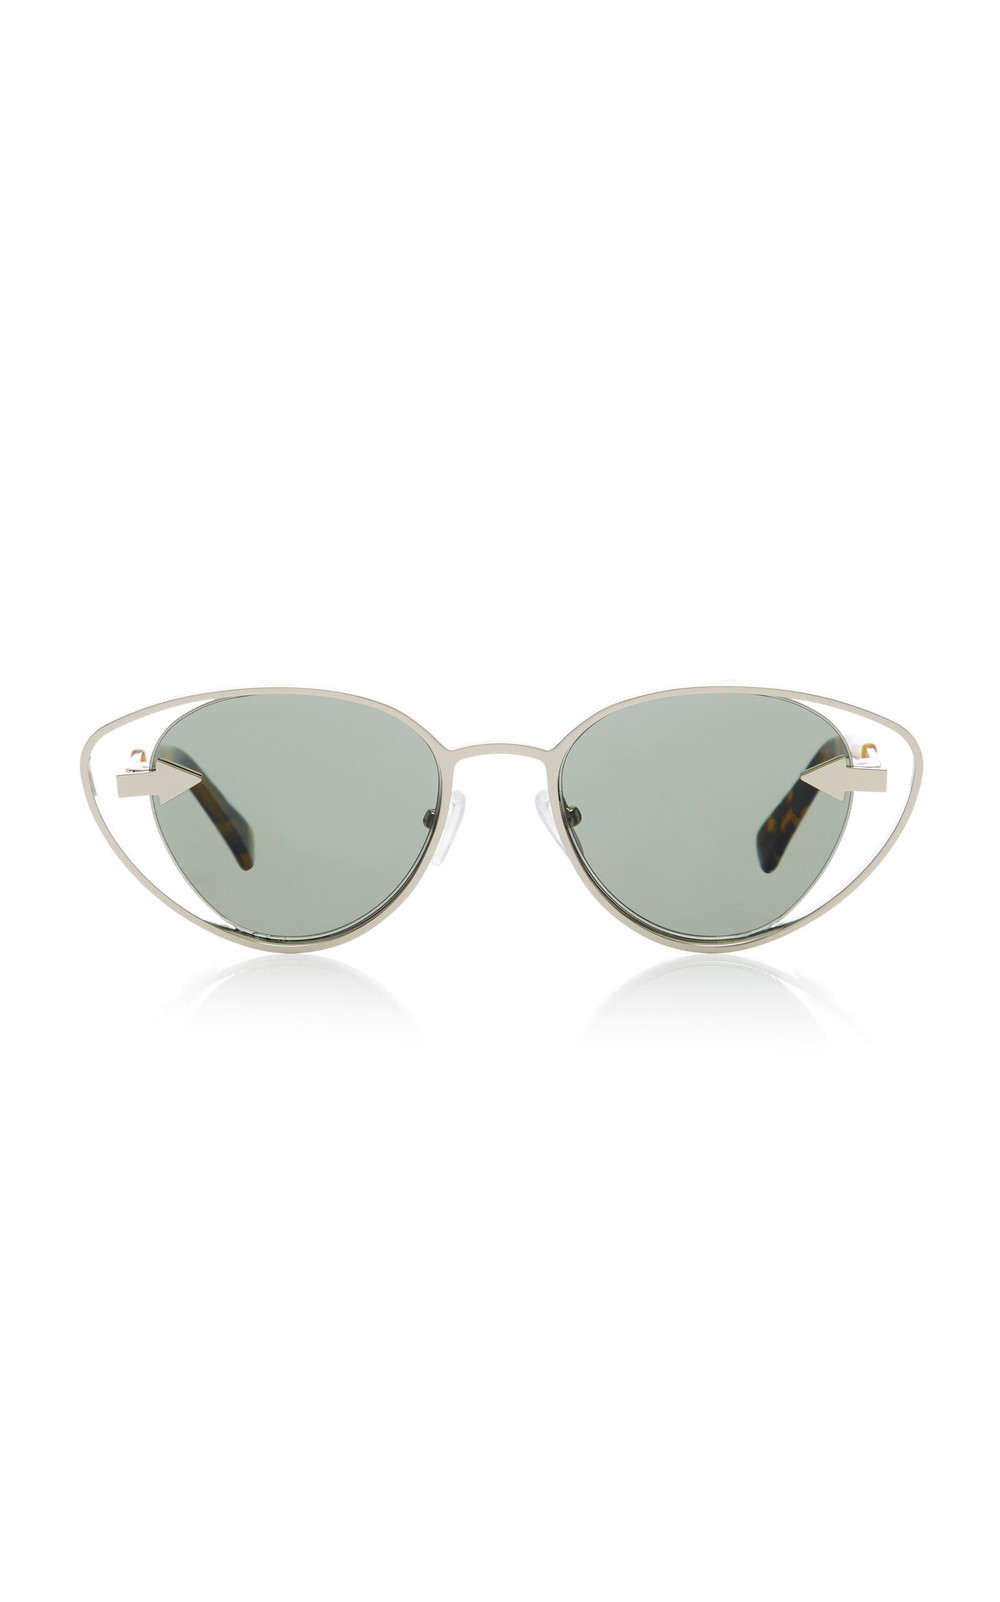 Karen Walker Kissy Kissy Cat-Eye Sunglasses in gold